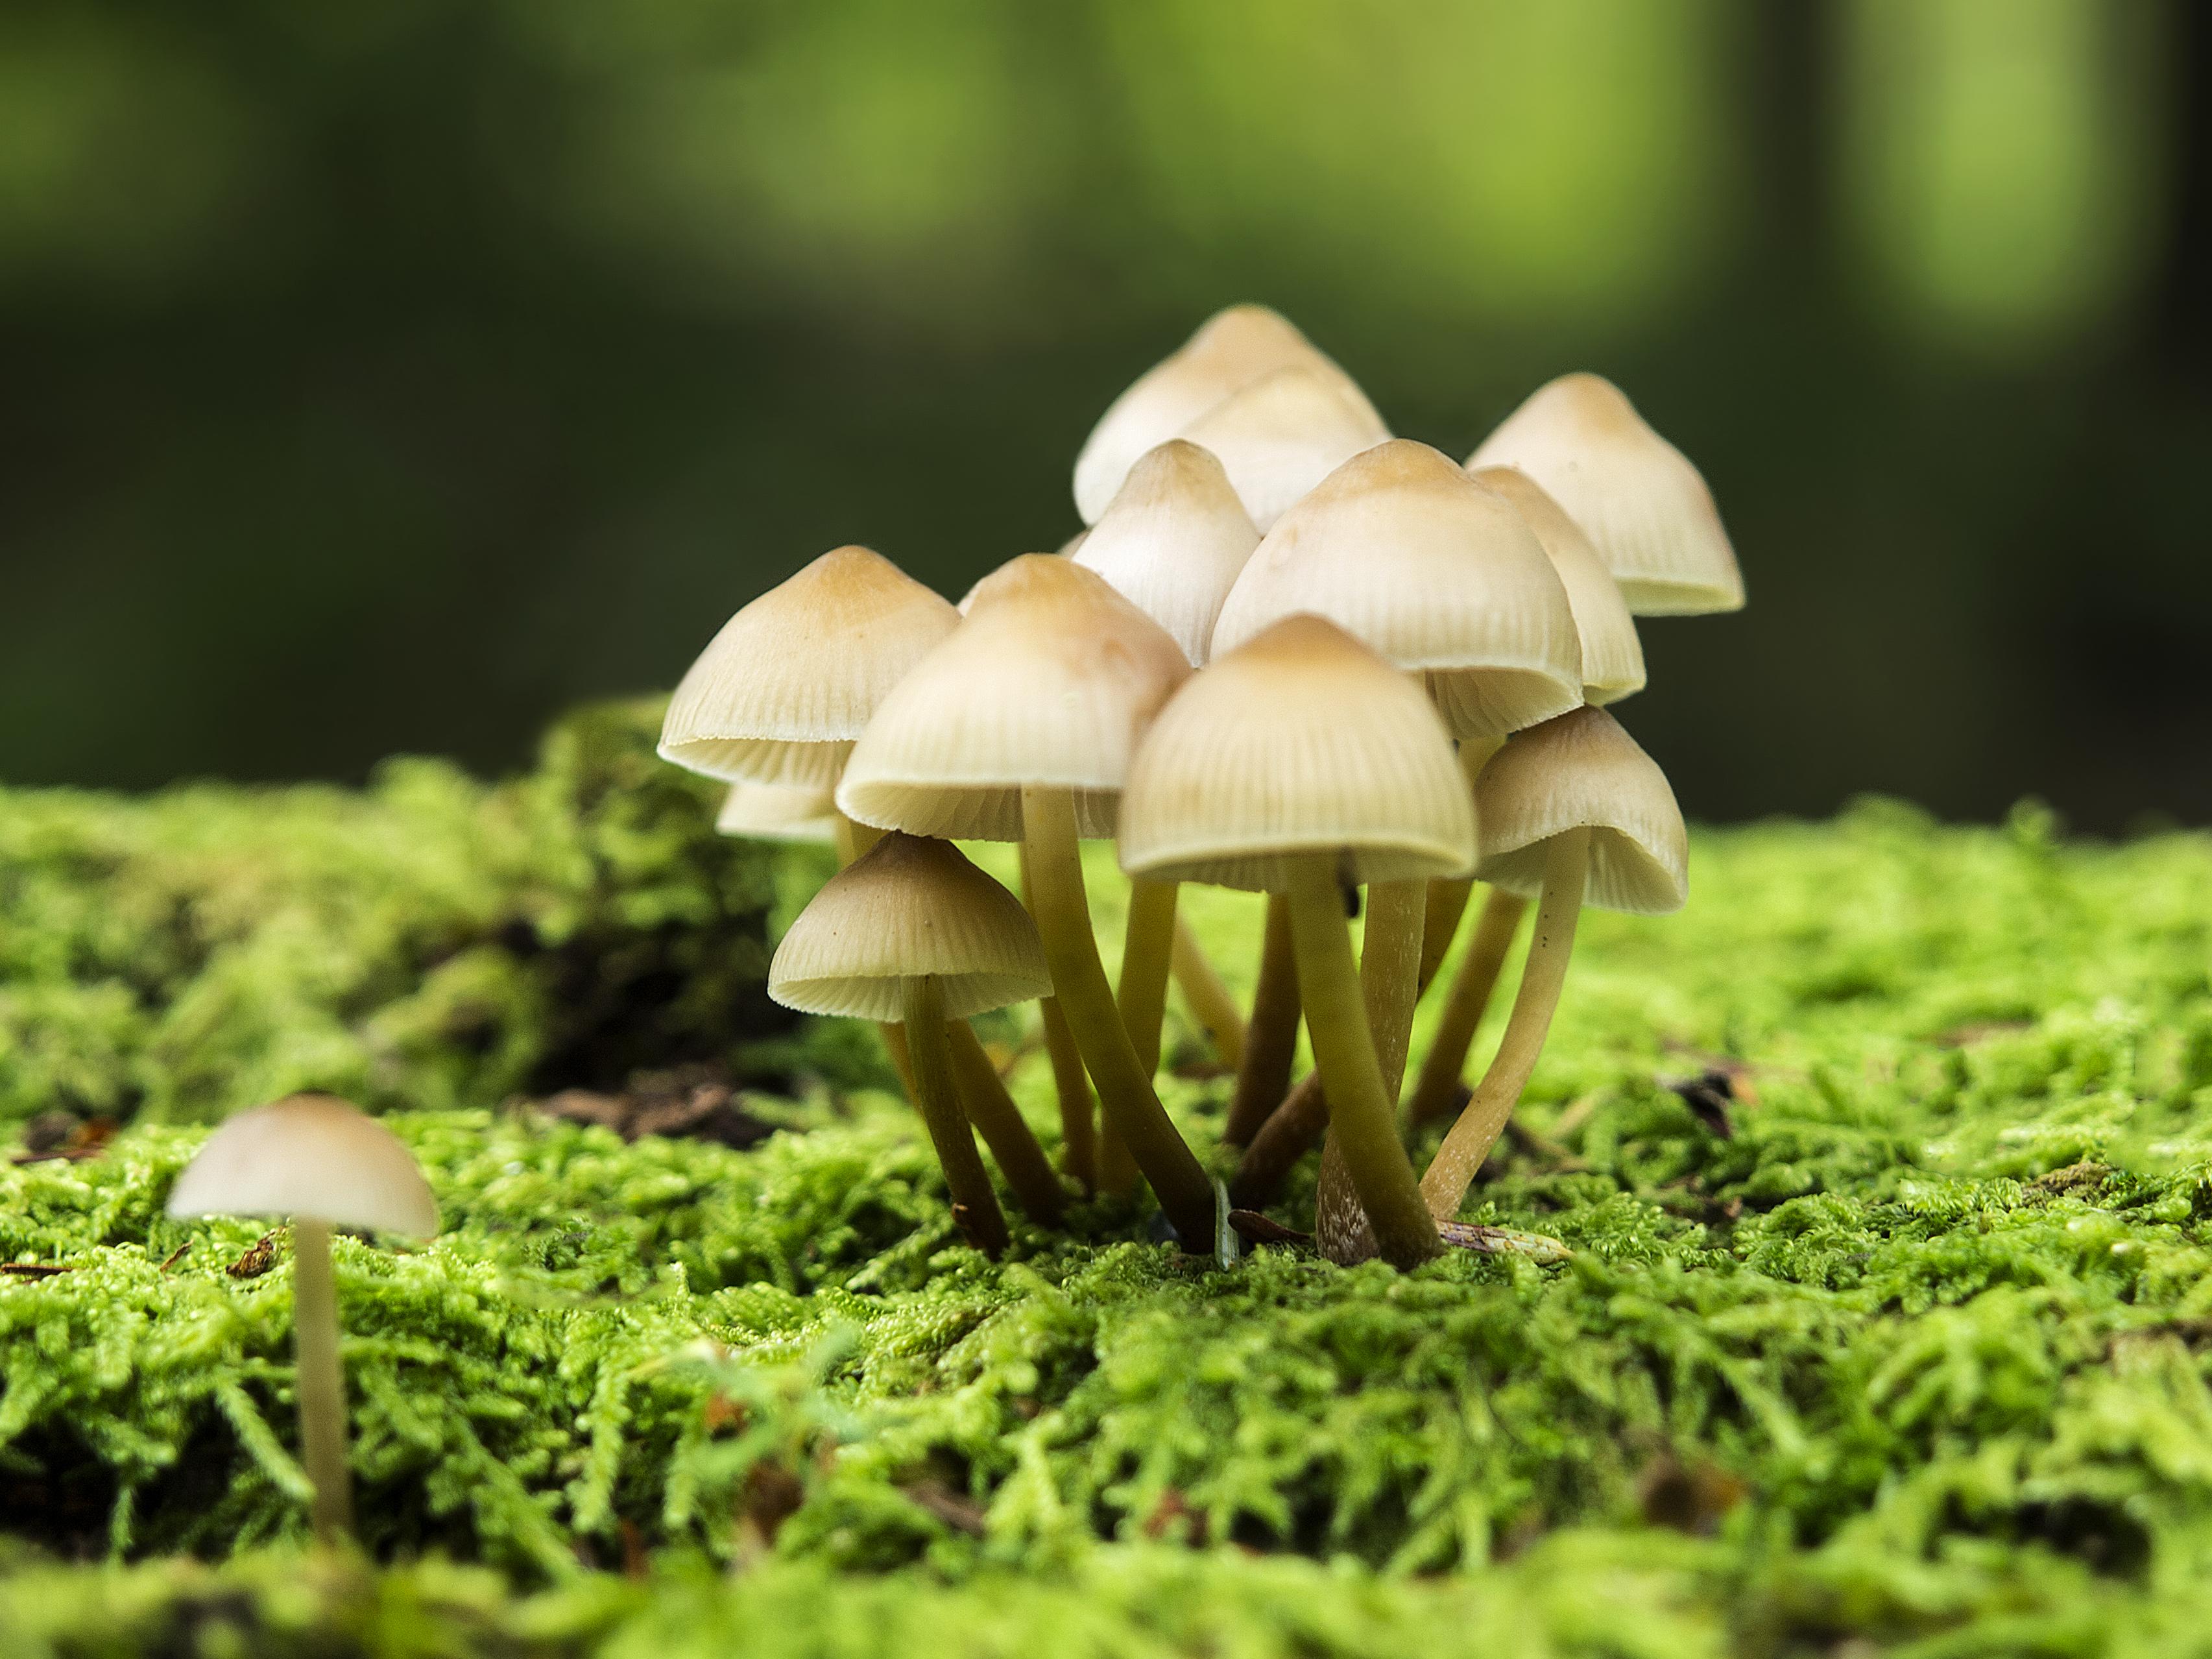 psychedelic mushroom wallpaper hd